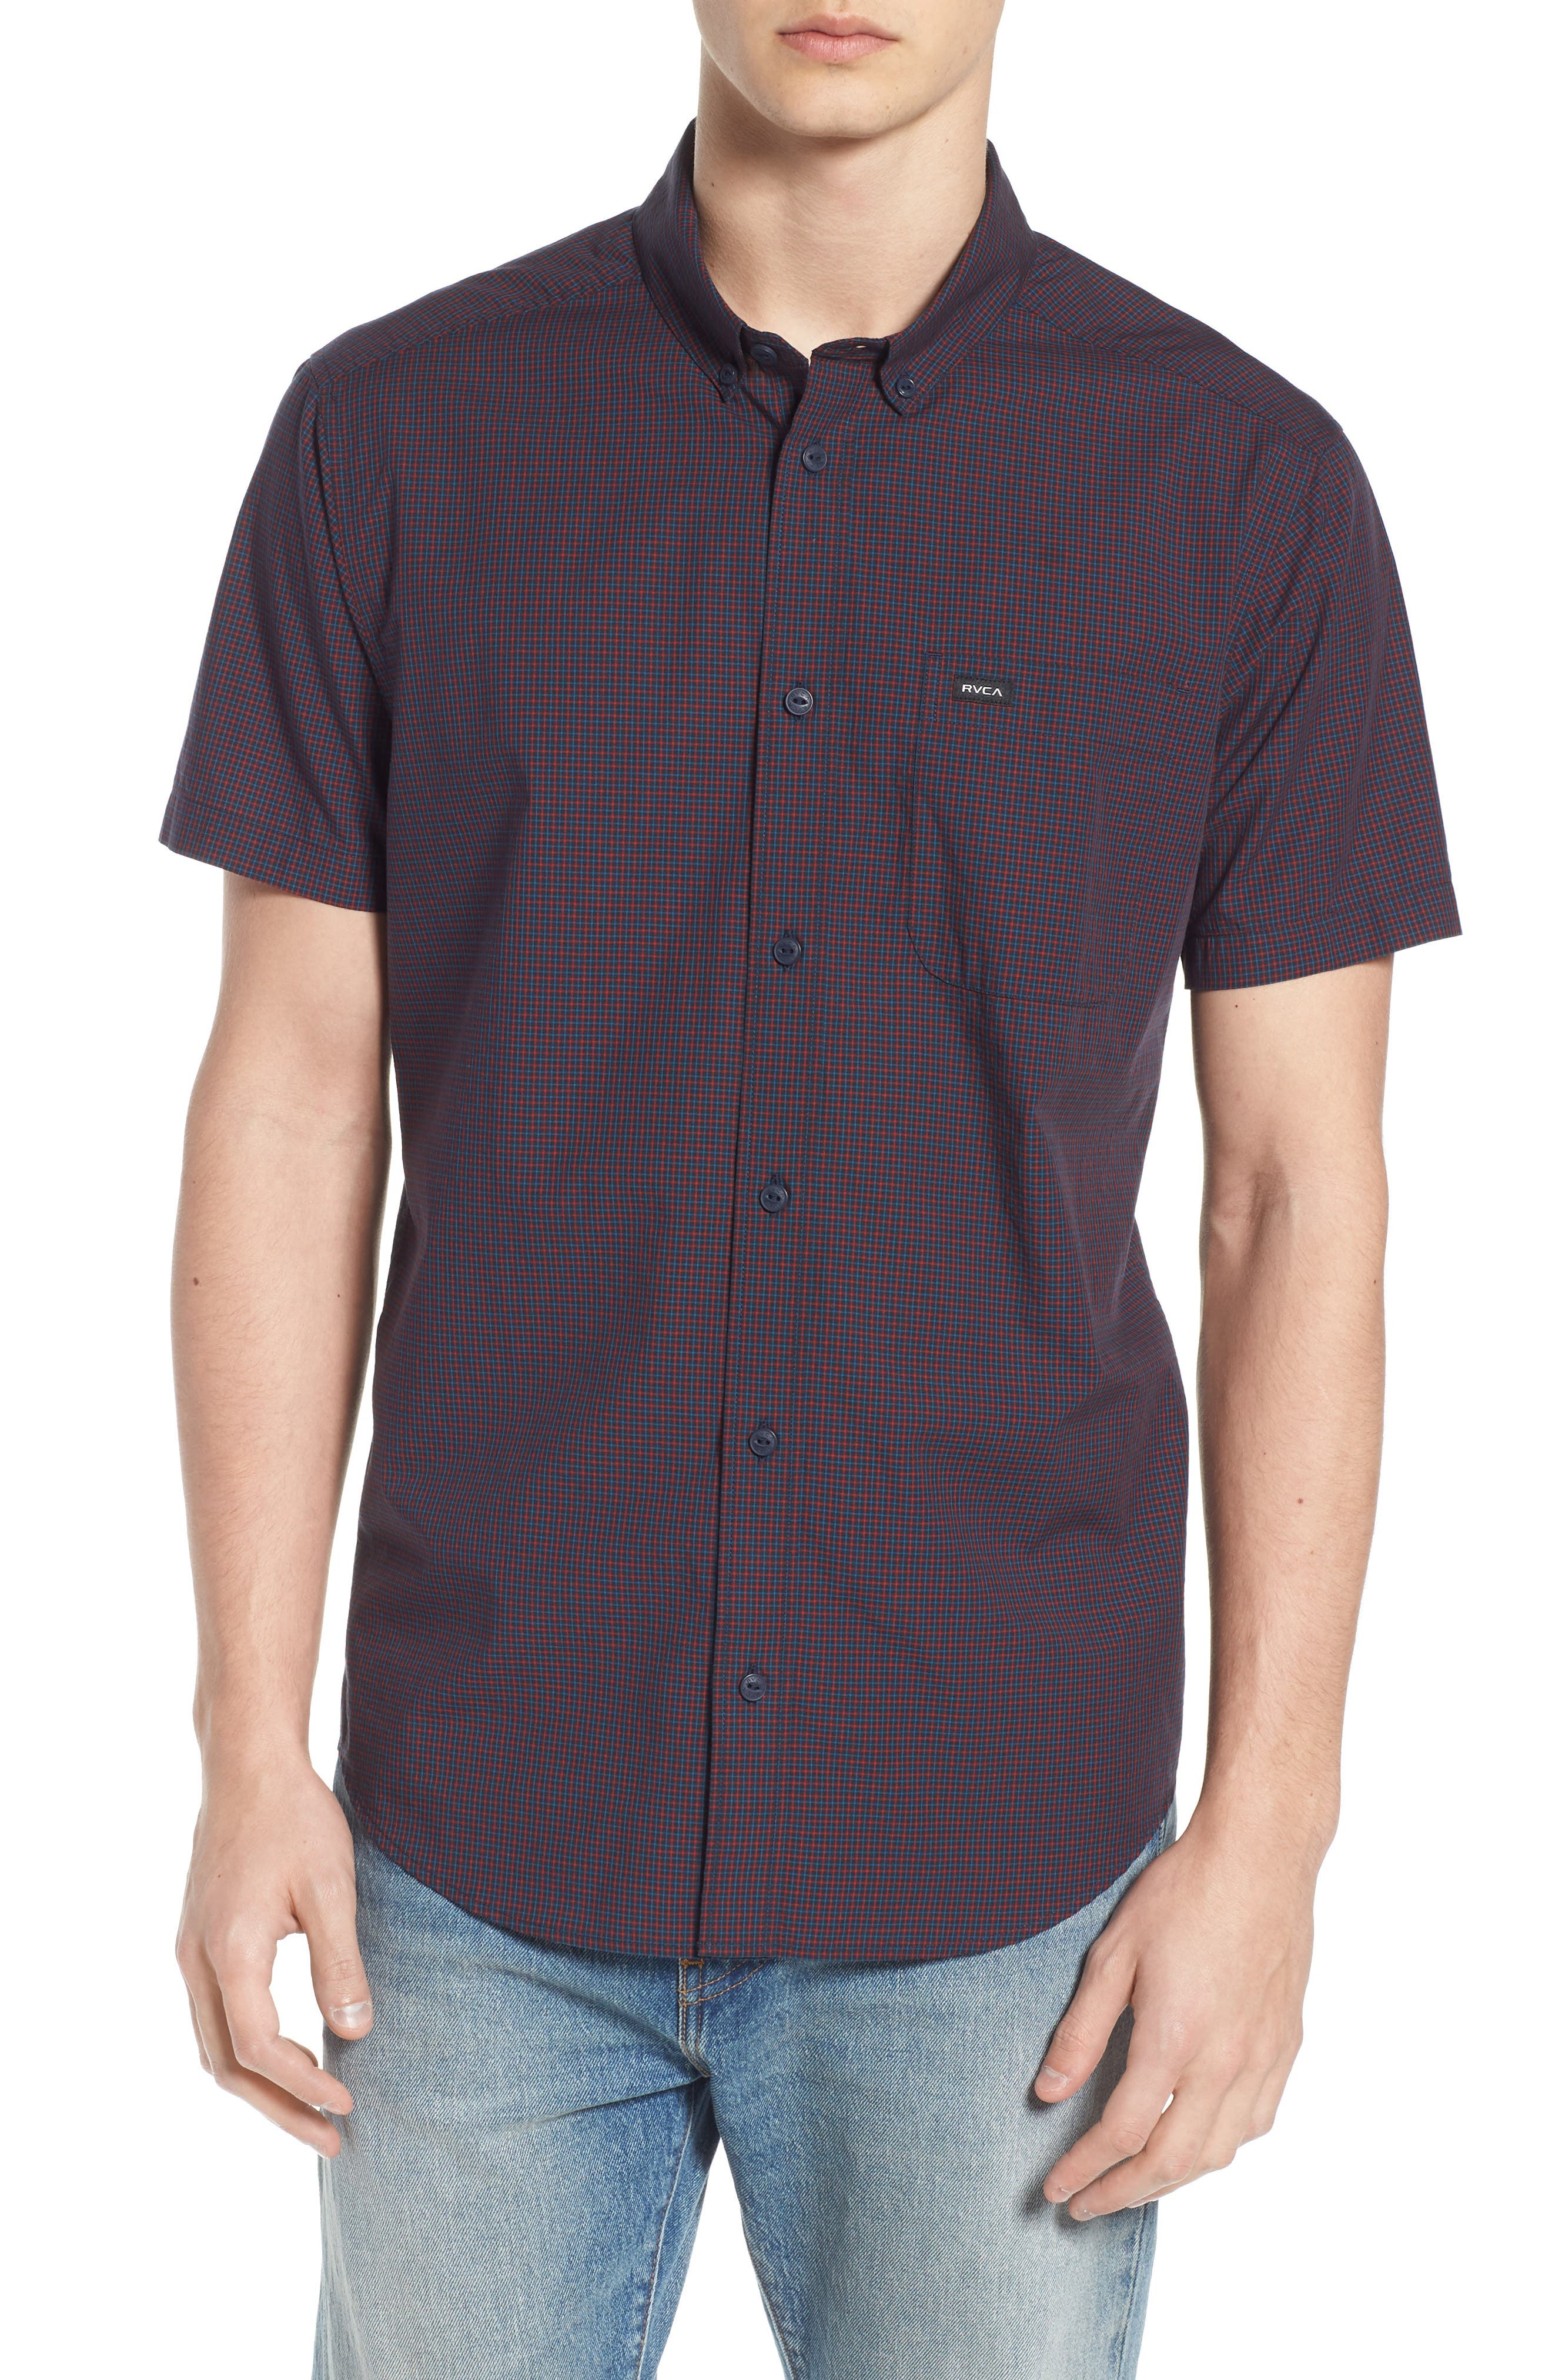 Staple Woven Shirt,                             Main thumbnail 1, color,                             NEW NAVY